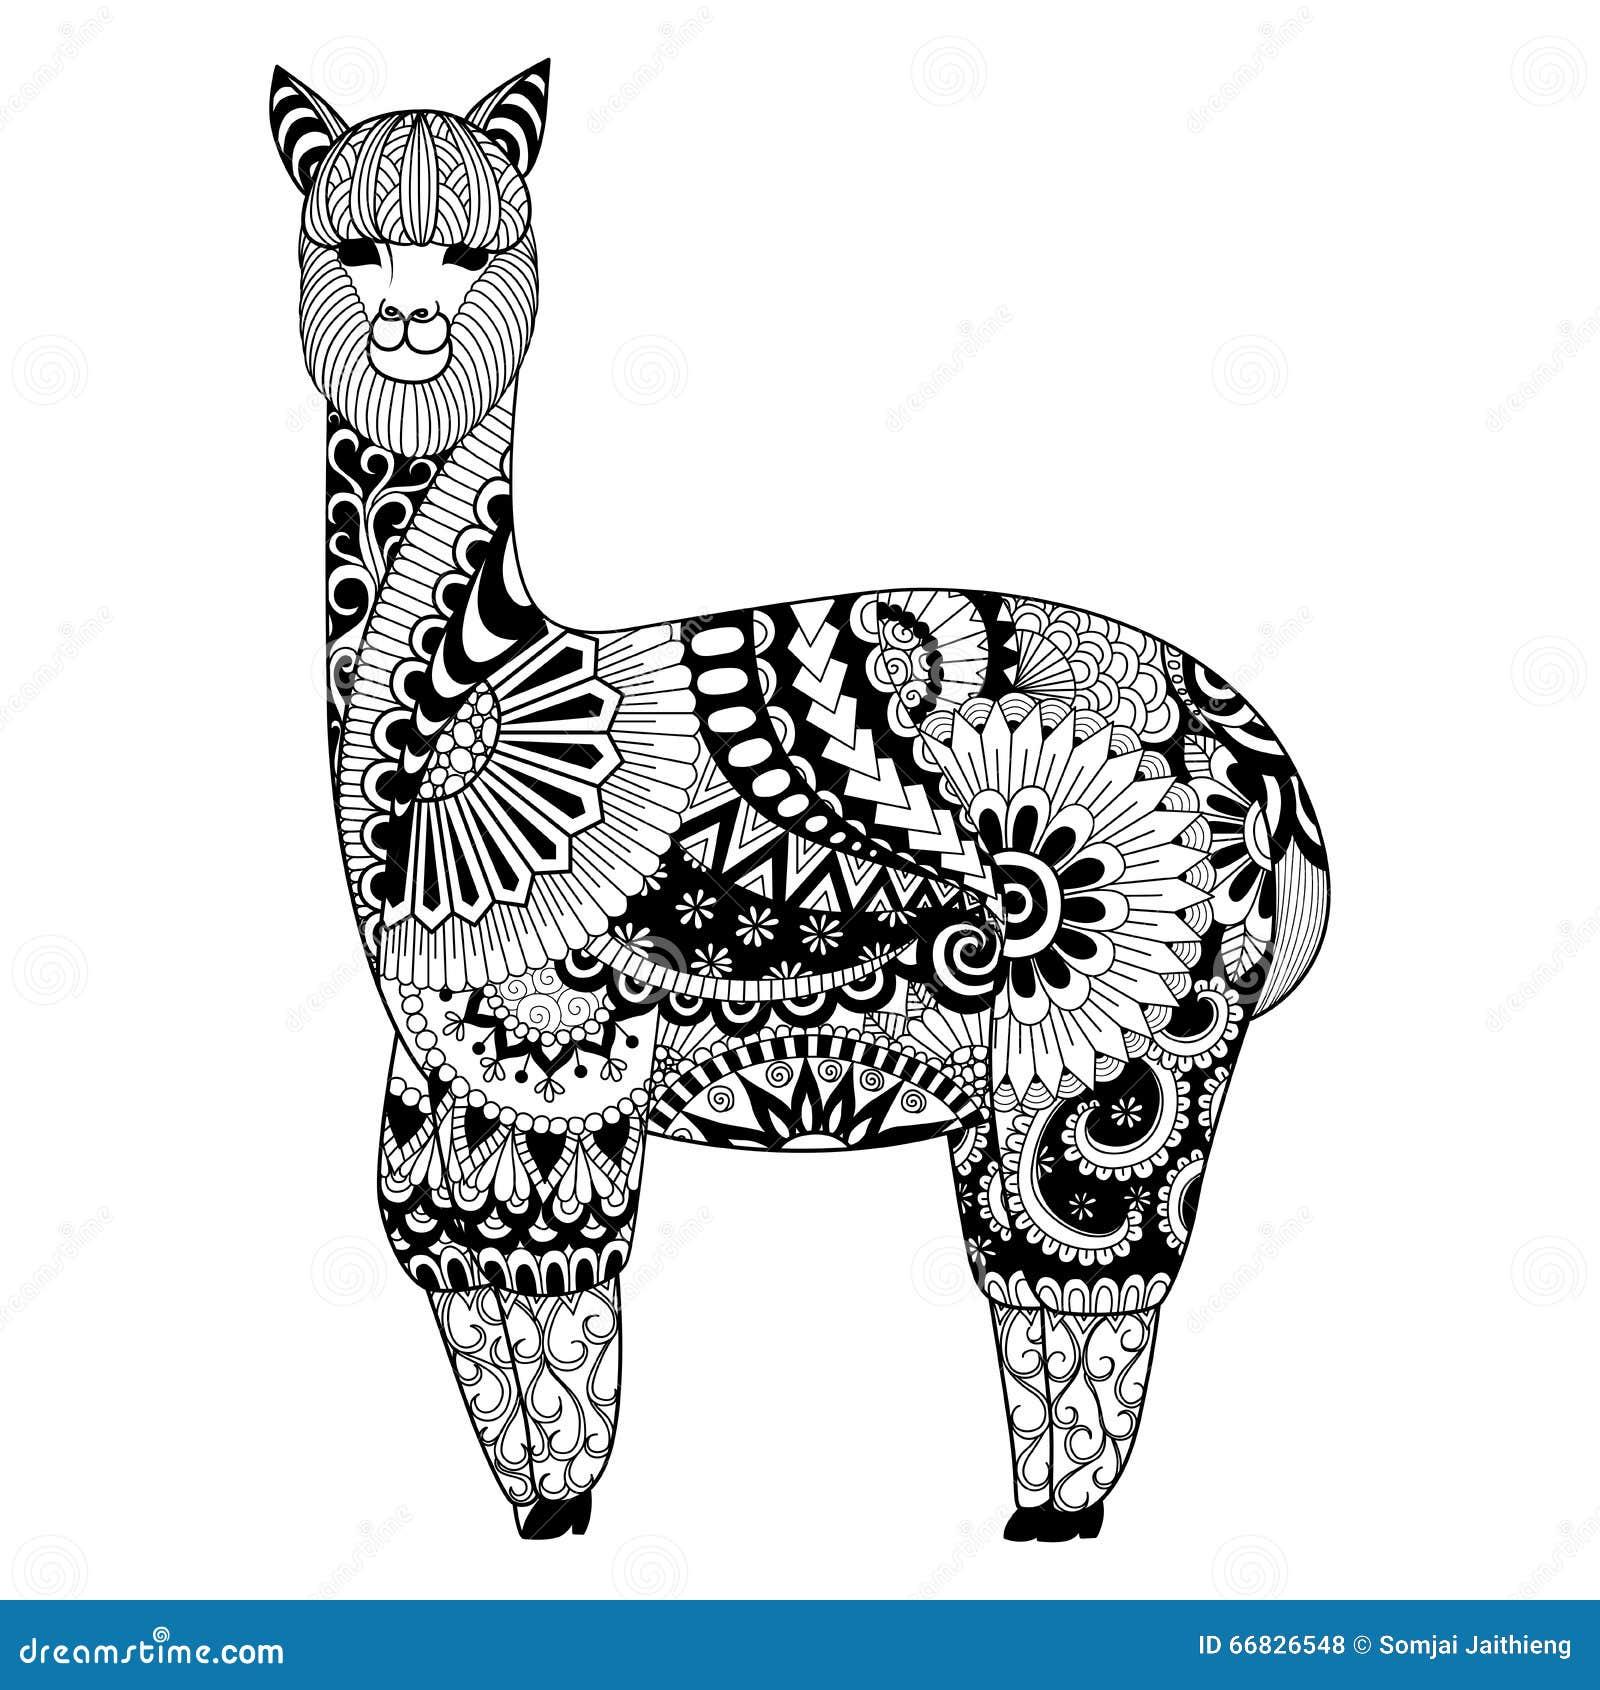 Shirt design book - Alpaca Zentangle Design For Coloring Book For Adult Logo T Shirt Design And So